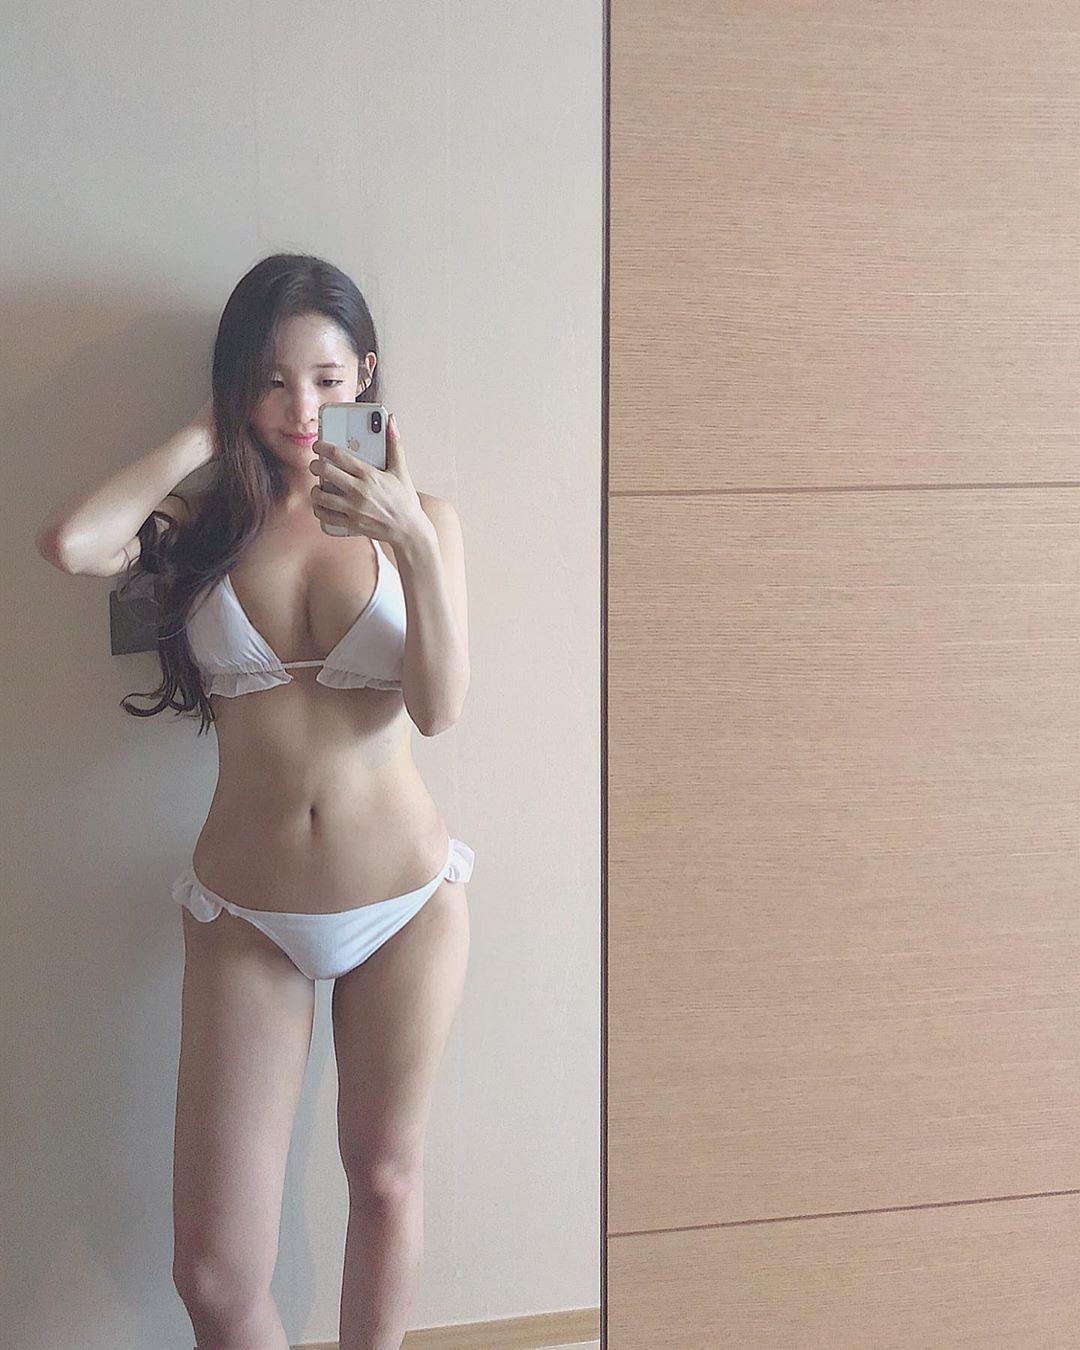 韩国美女noooree李恩娜[25P]